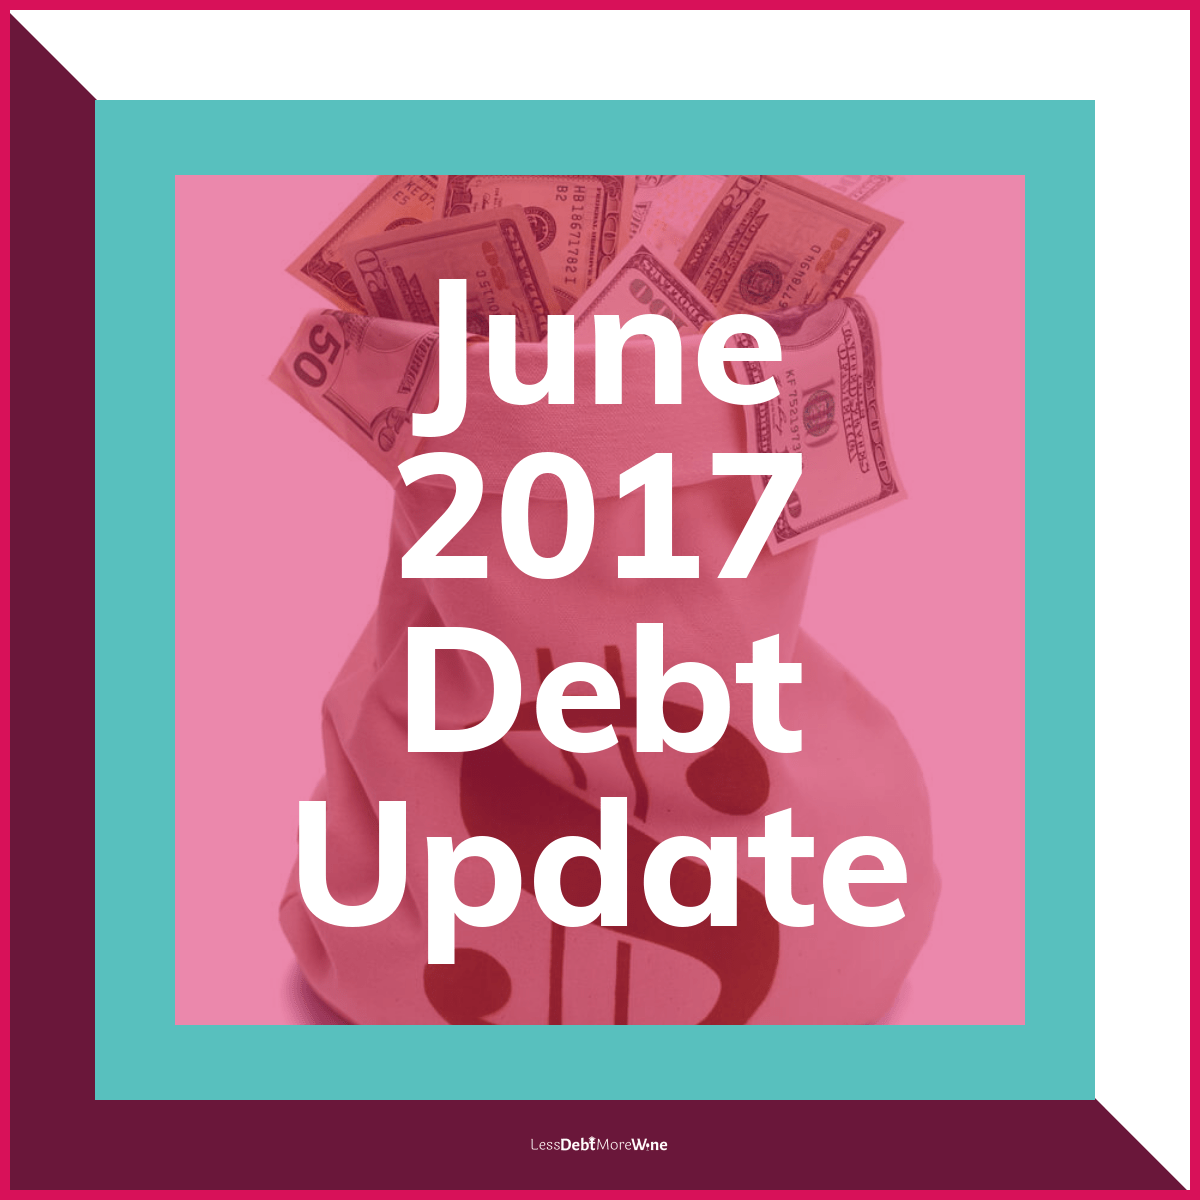 June 2017 debt update, debt payoff progress